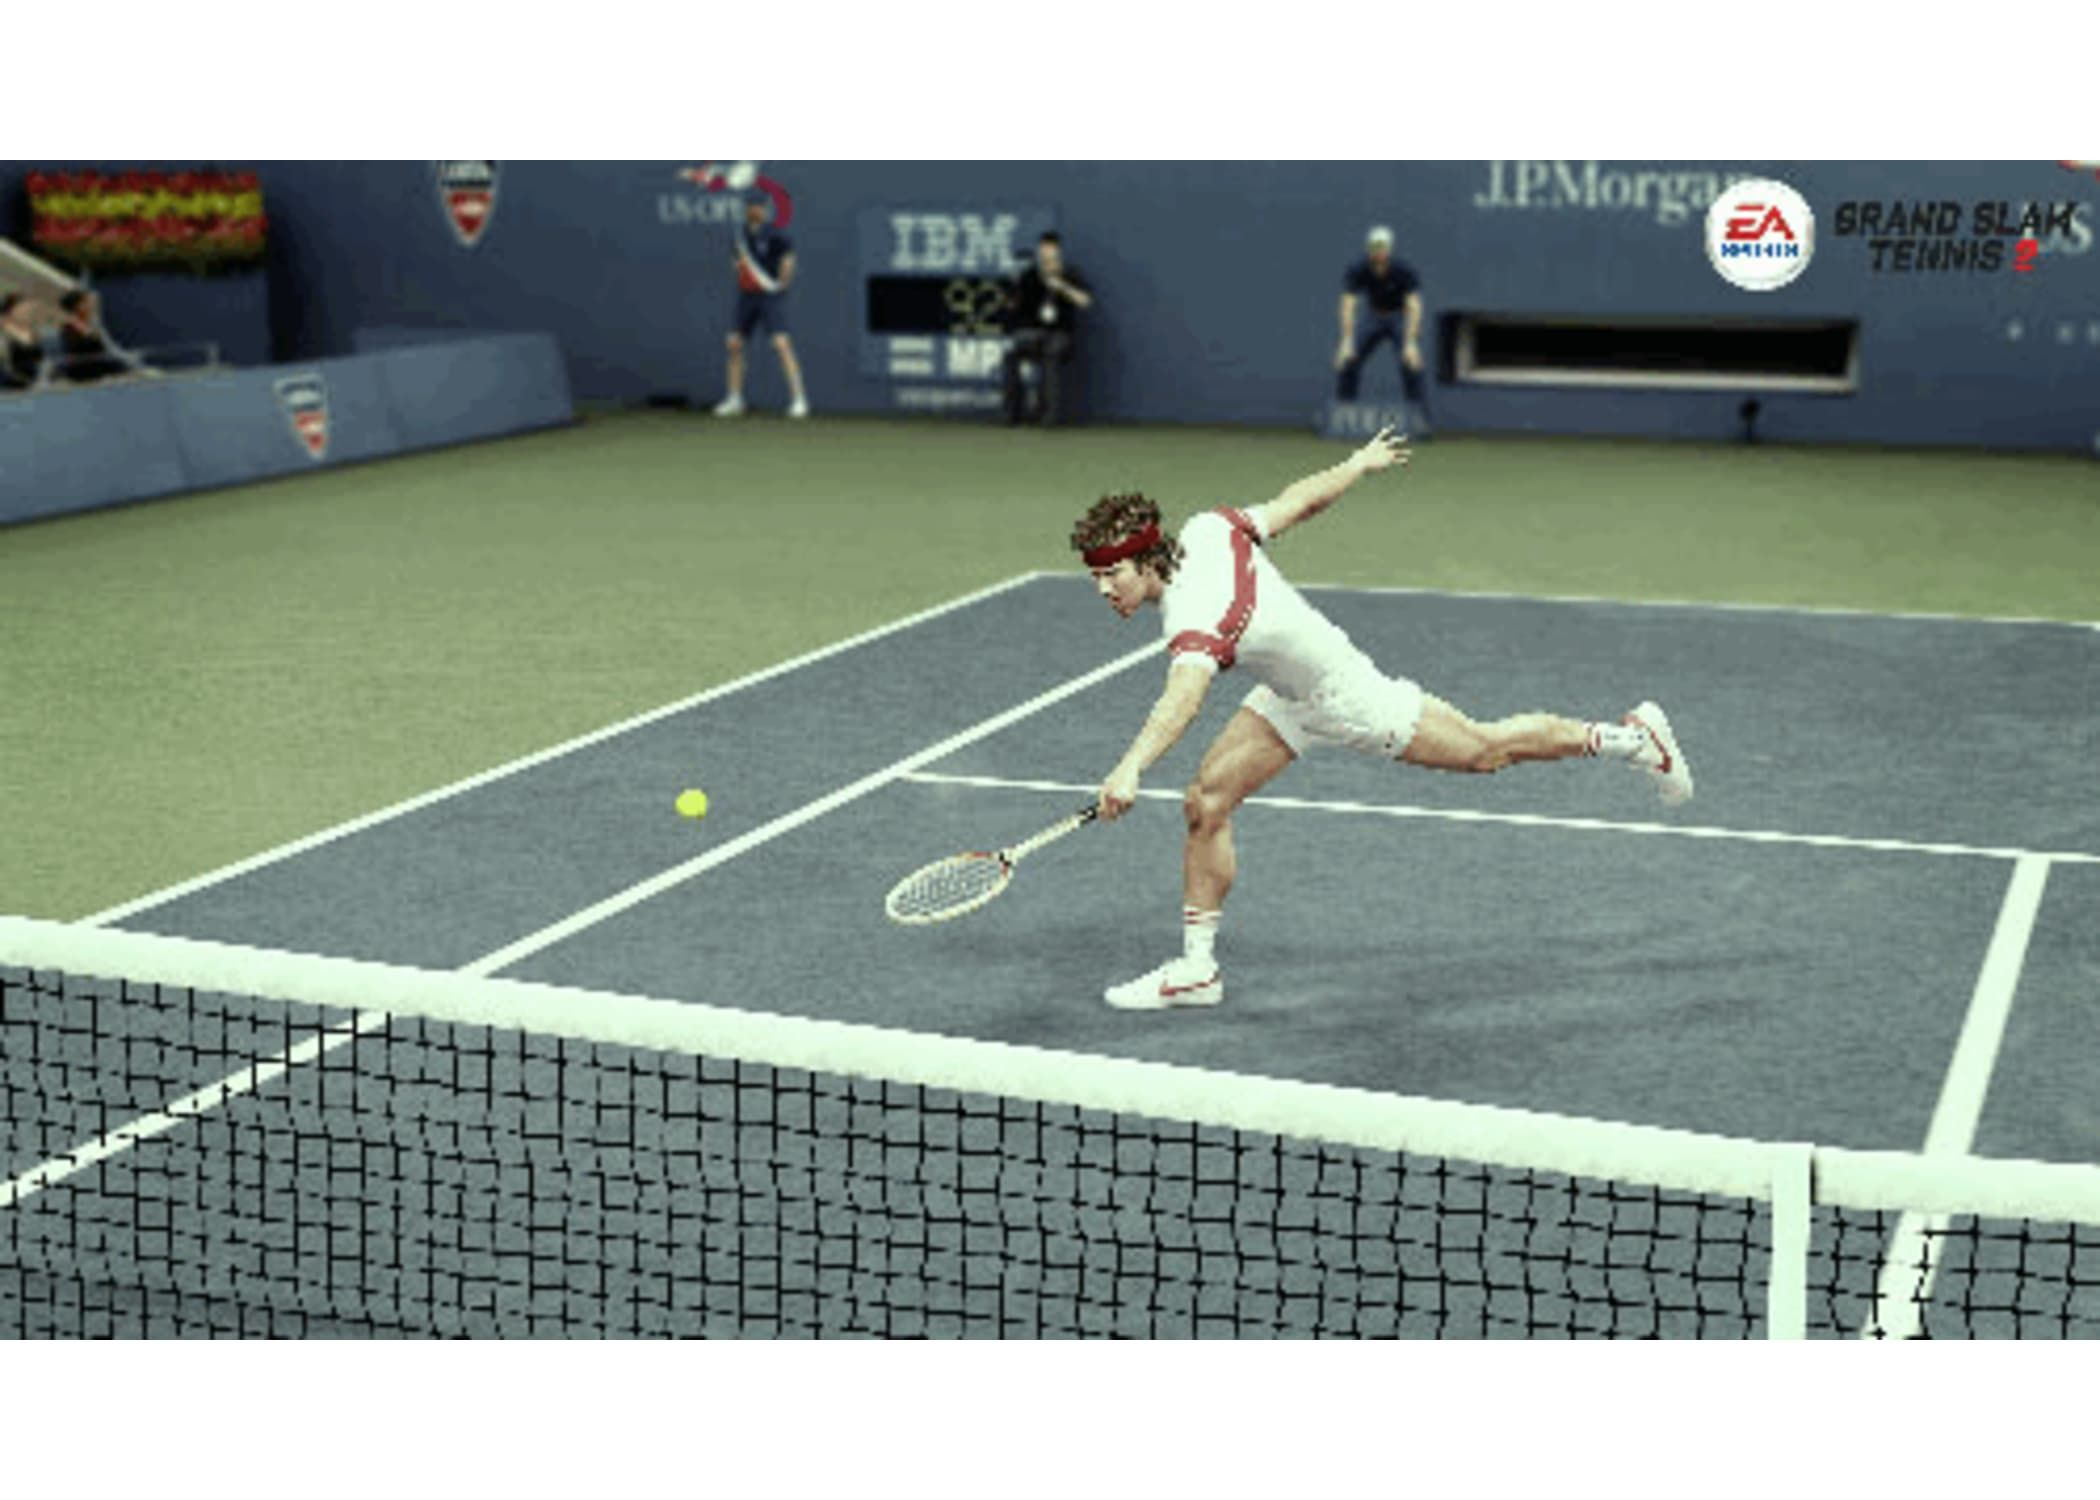 Buy Ea Sports Grand Slam Tennis 2 On Playstation 3 Game Affiliate Ad Sports Grand Buy Ea Playst In 2020 Grand Slam Tennis Grand Slam Tennis 2 Grand Slam